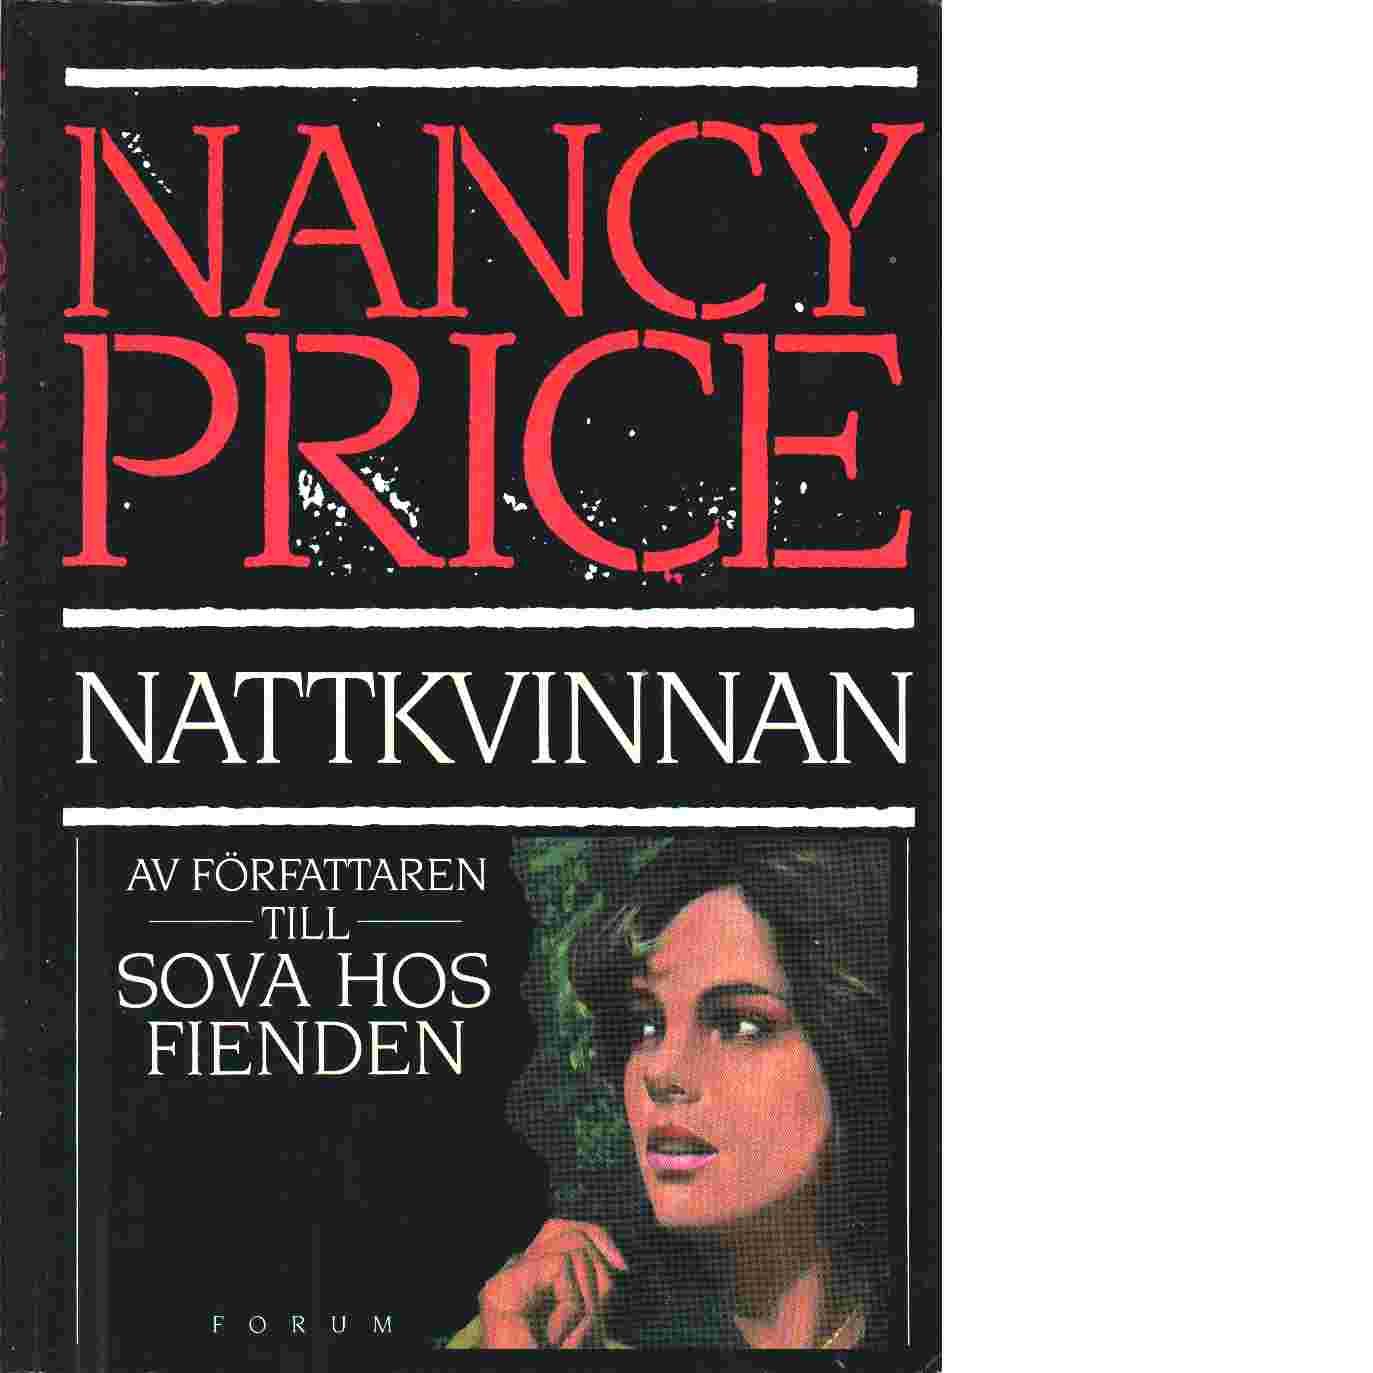 Nattkvinnan - Price, Nancy